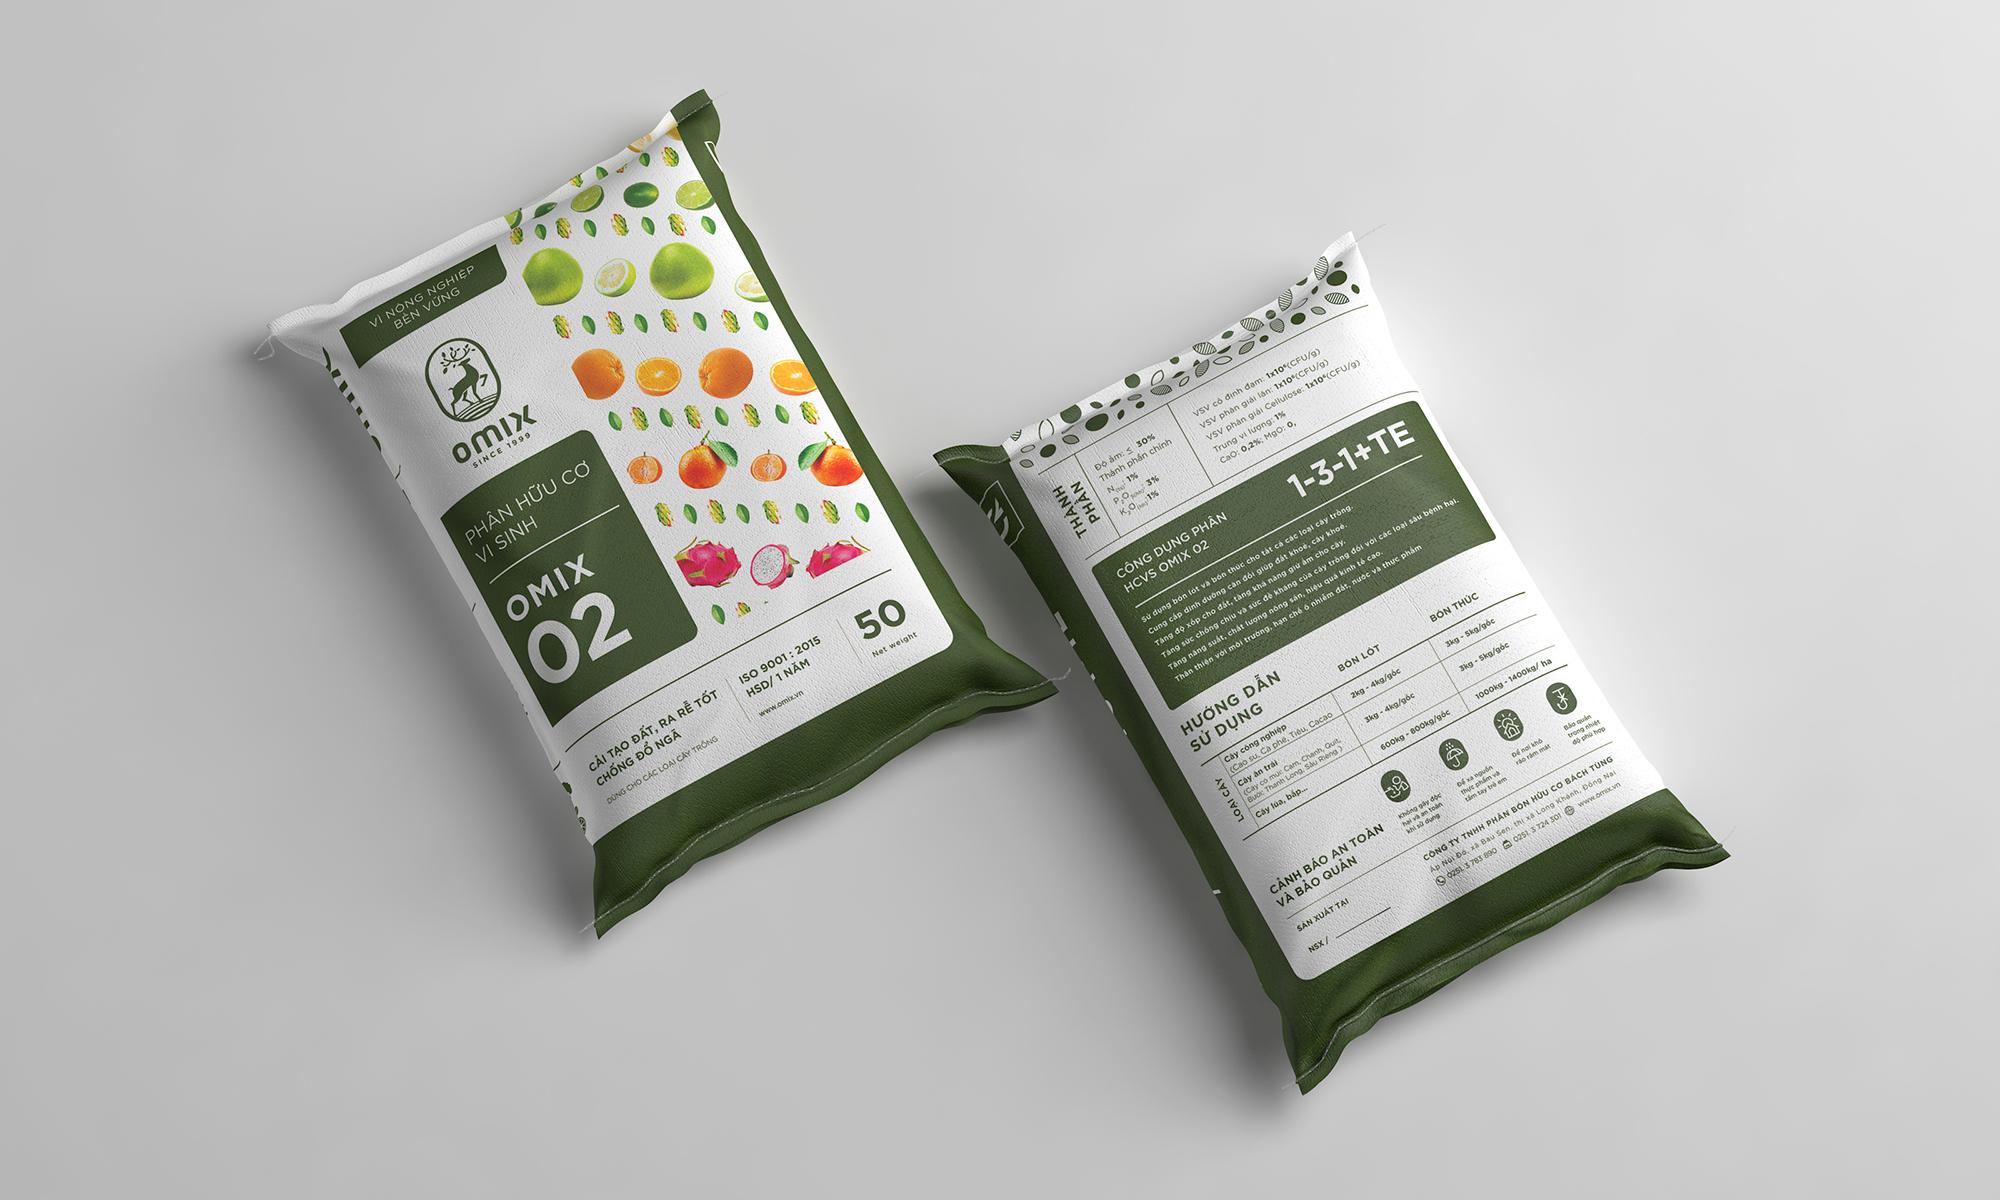 rgb_creative_ideas_design_packaging_bratus_omix_09